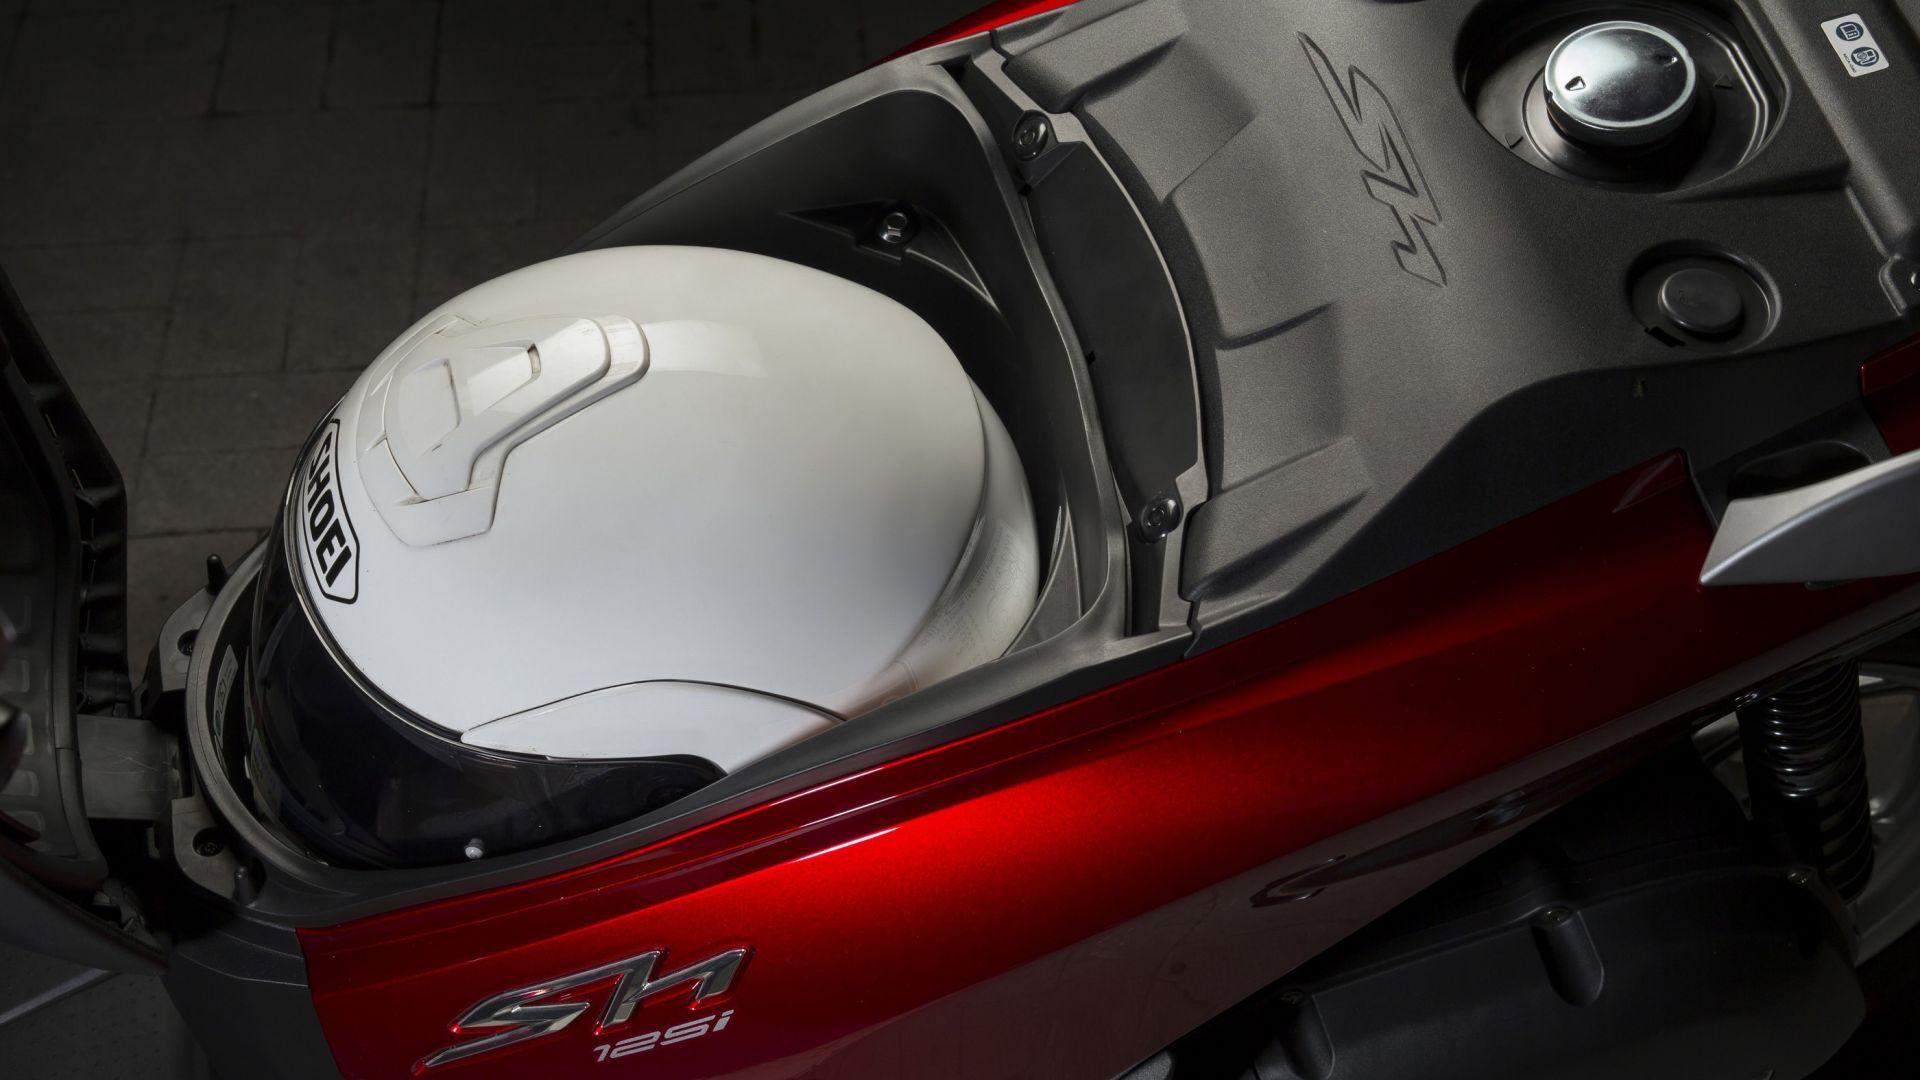 Immagine 3: Honda SH 125/150i ABS 2013